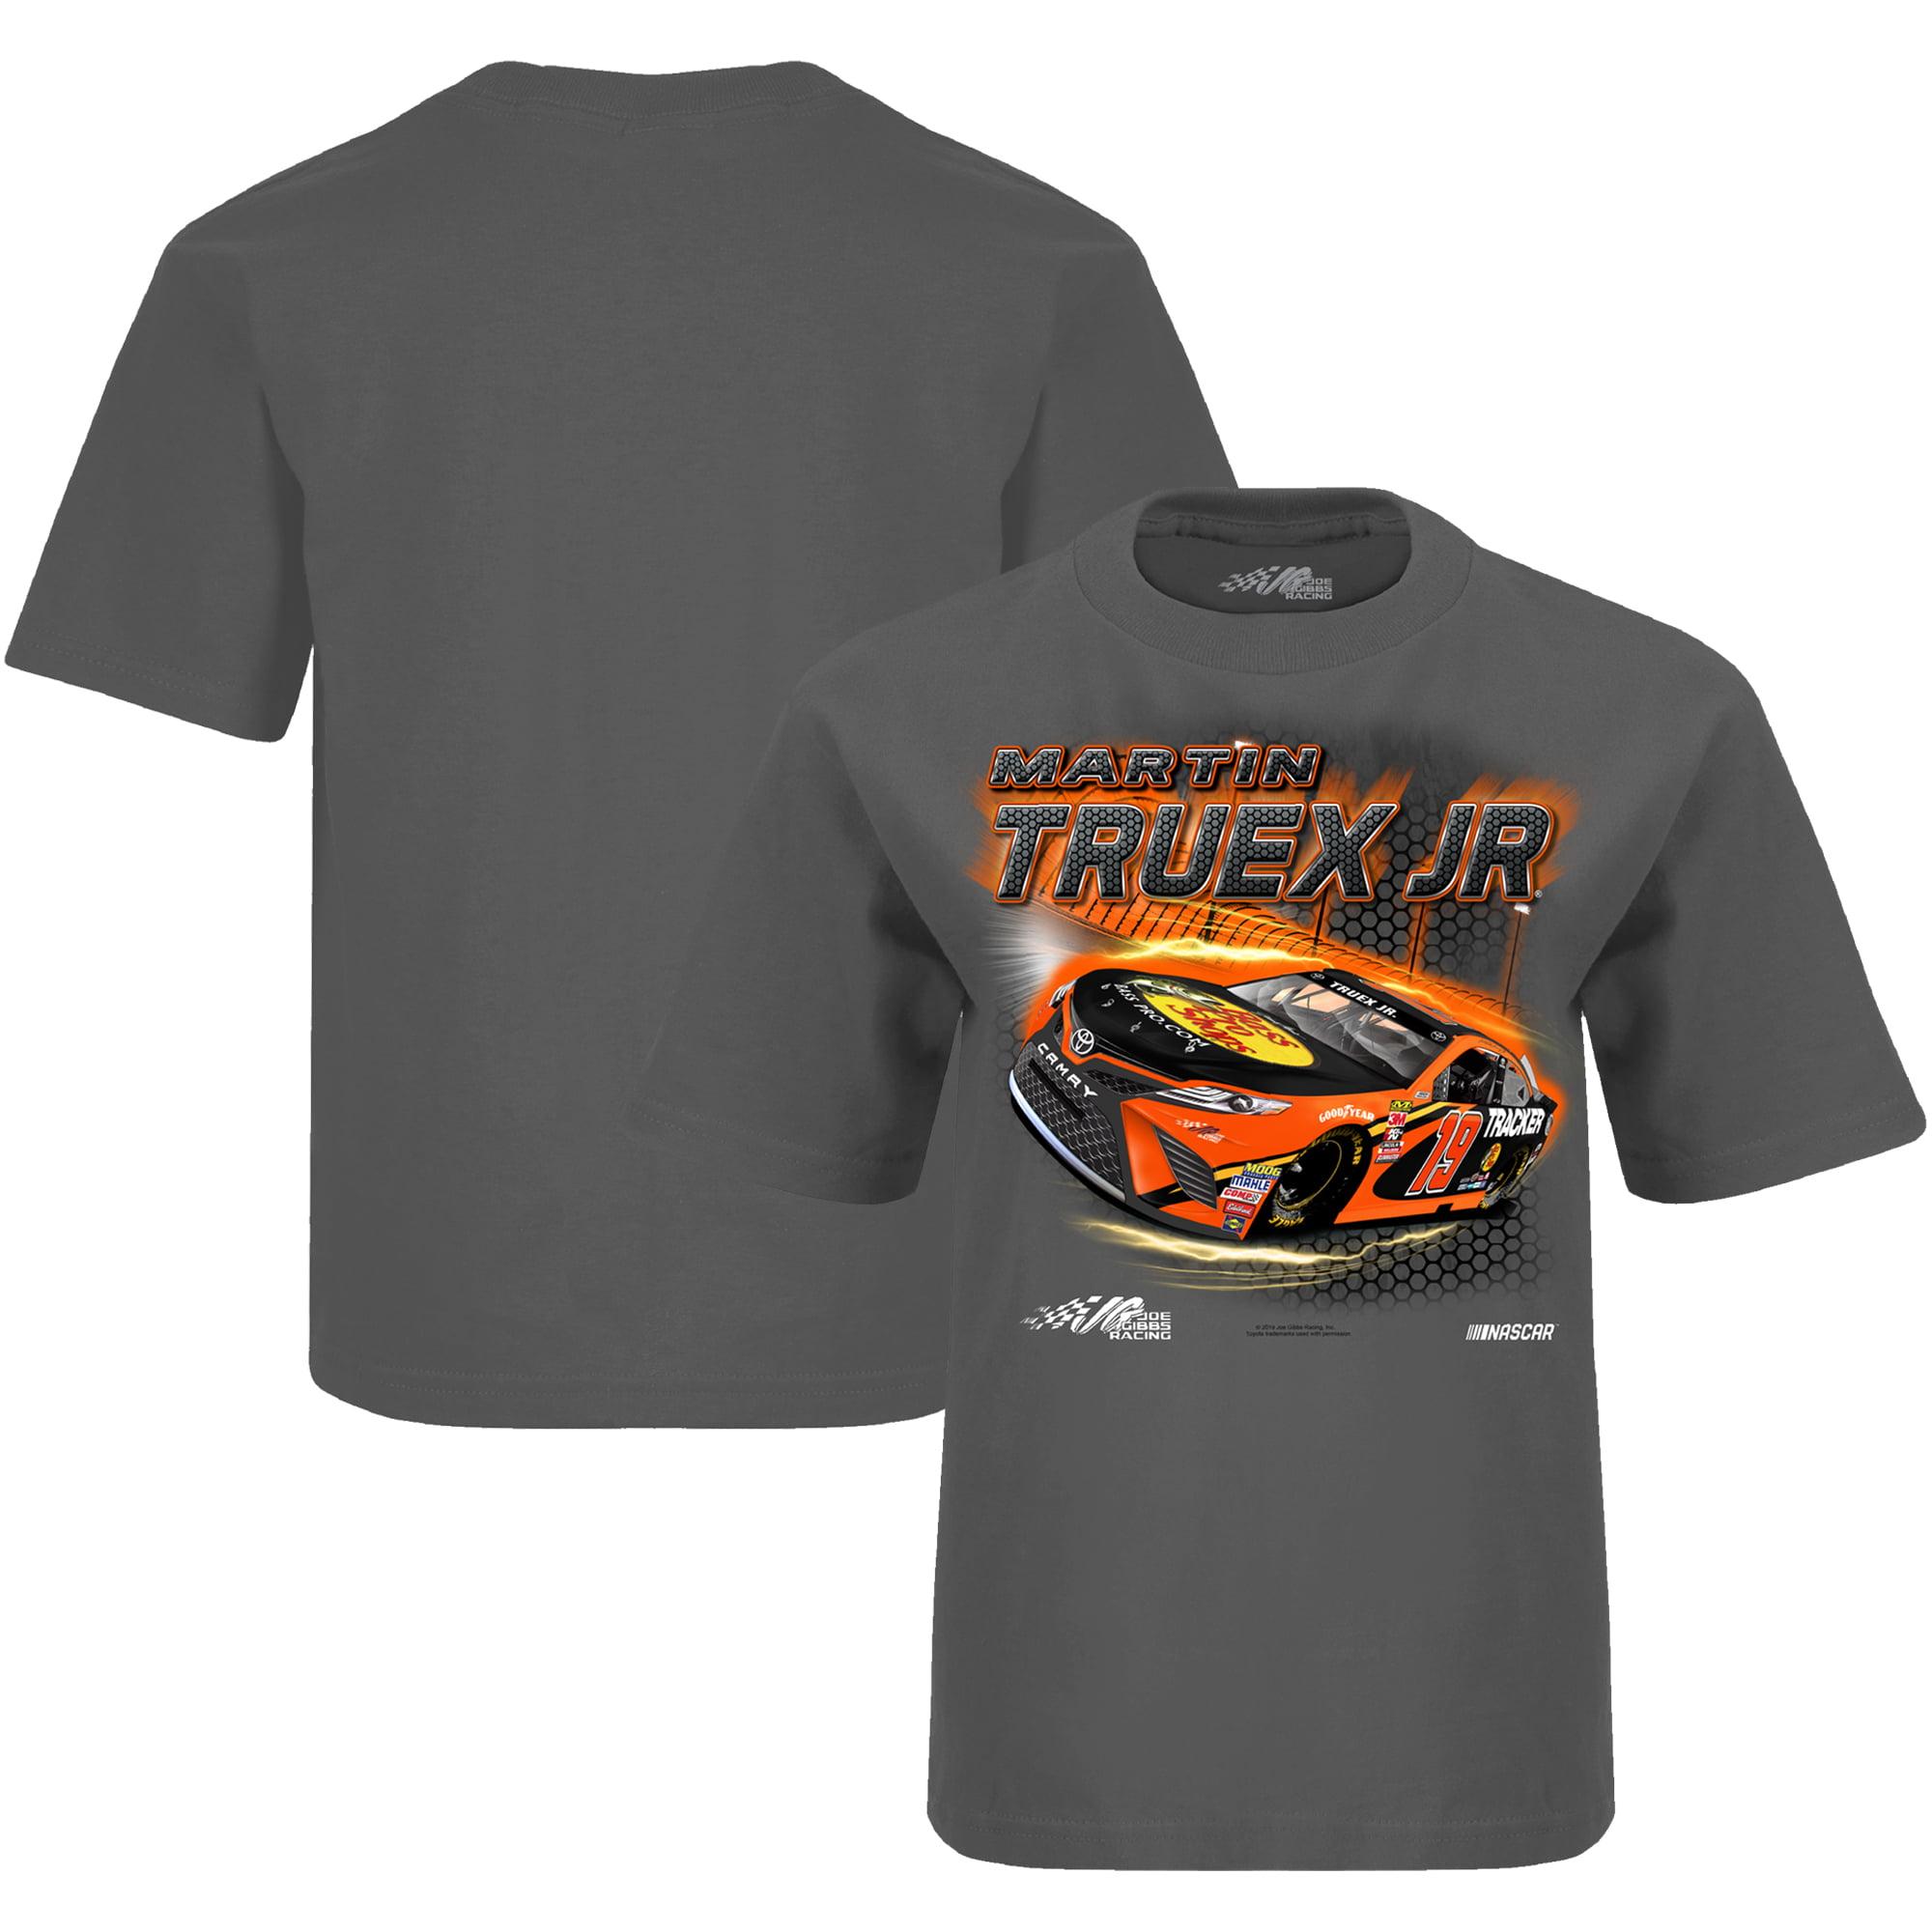 Martin Truex Jr Joe Gibbs Racing Team Collection Youth Ultimate Car T-Shirt - Charcoal